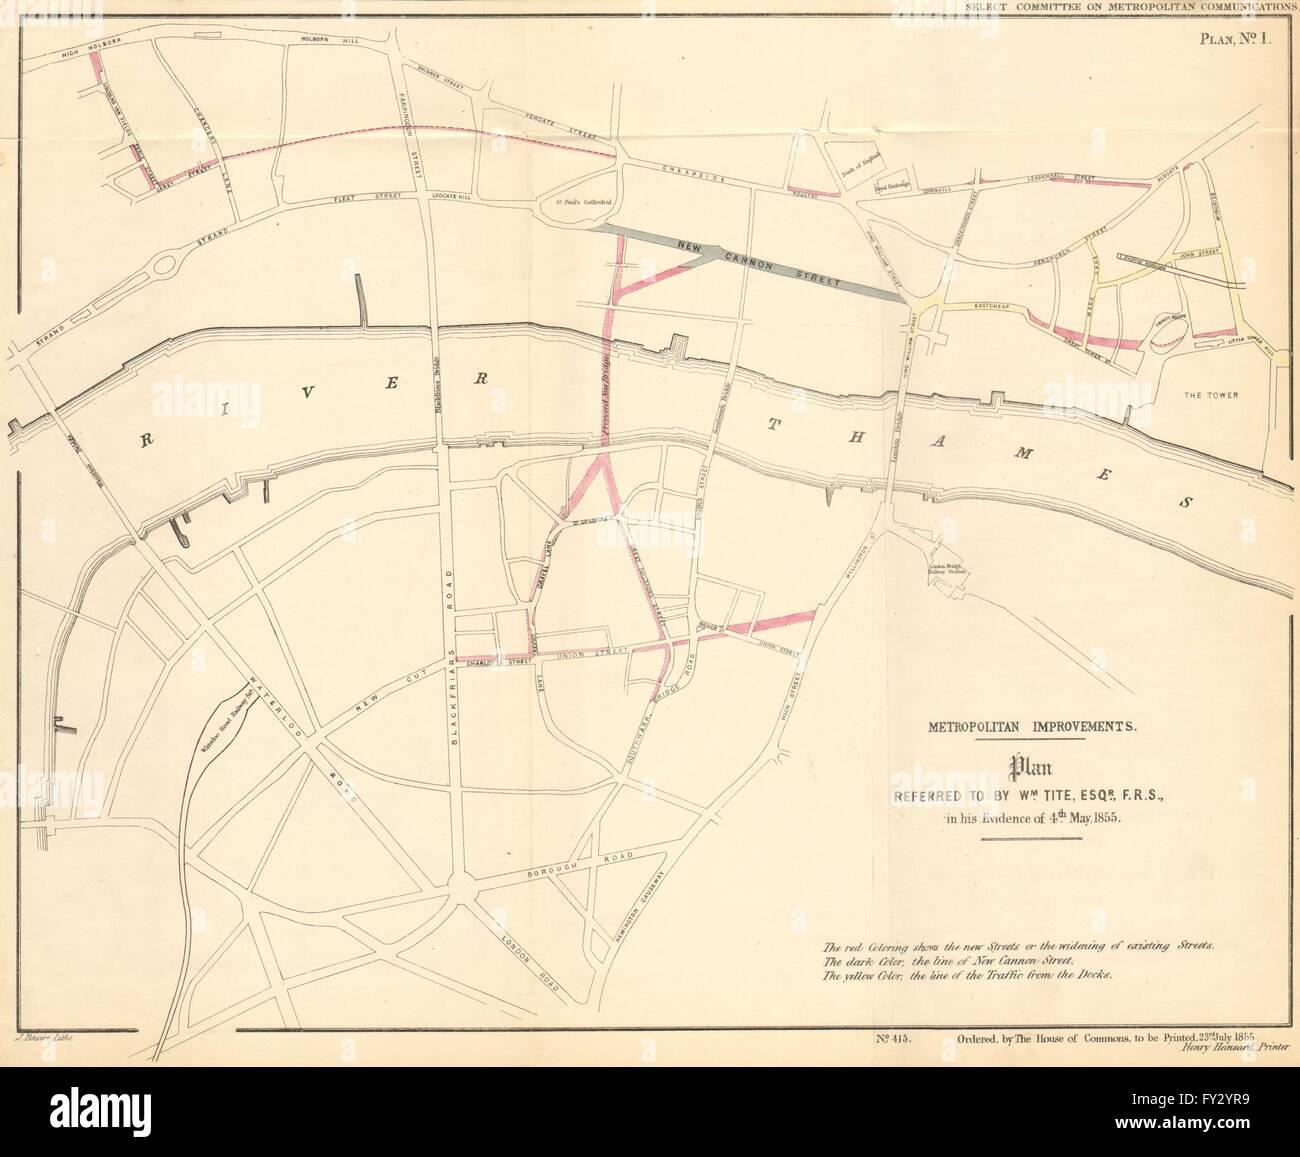 Proposed London road improvements, including ST PAUL'S BRIDGE. TITE, 1855 map - Stock Image